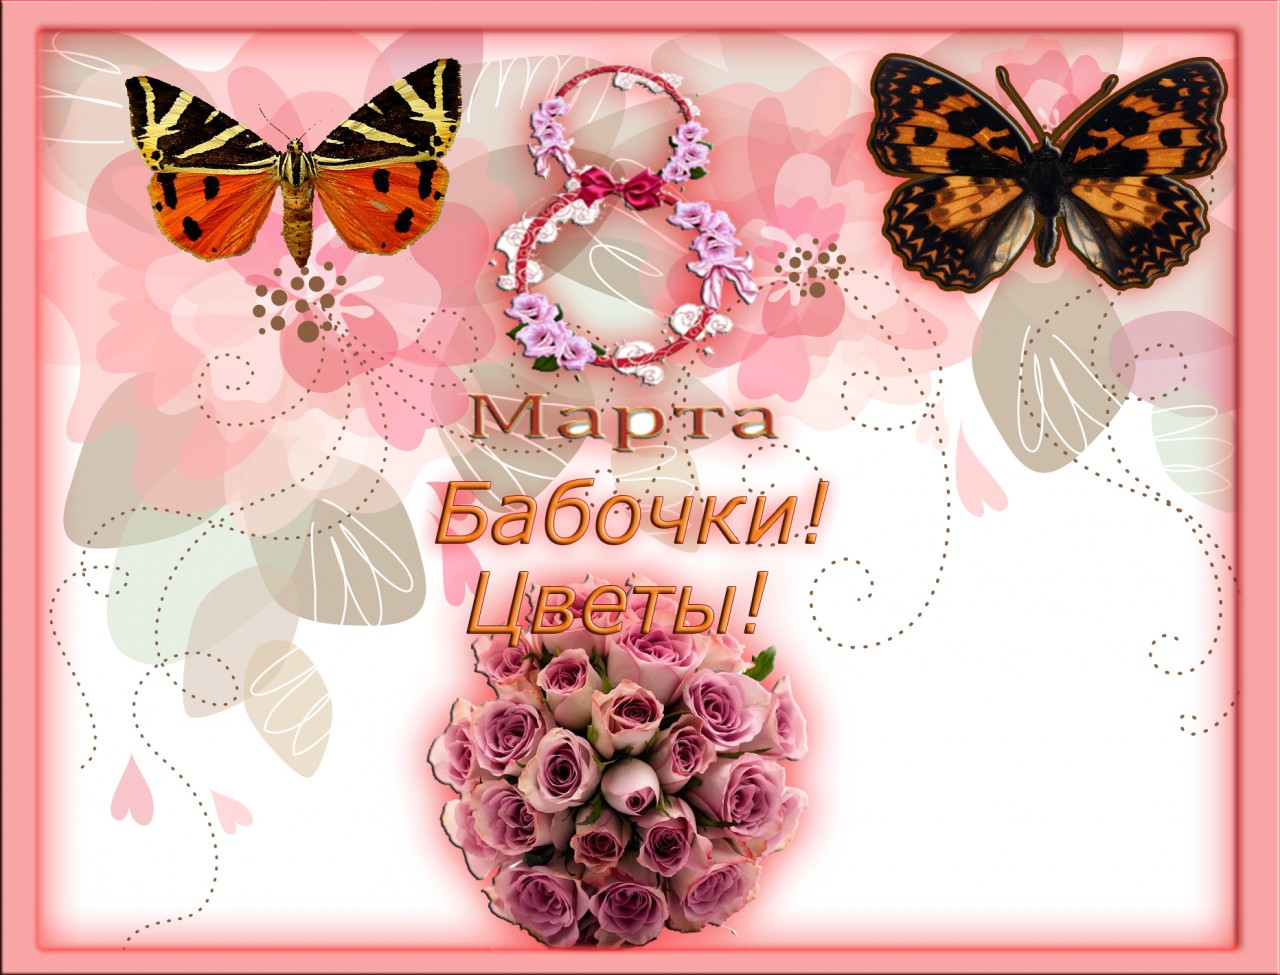 8 Марта! Бабочки! Цветы!